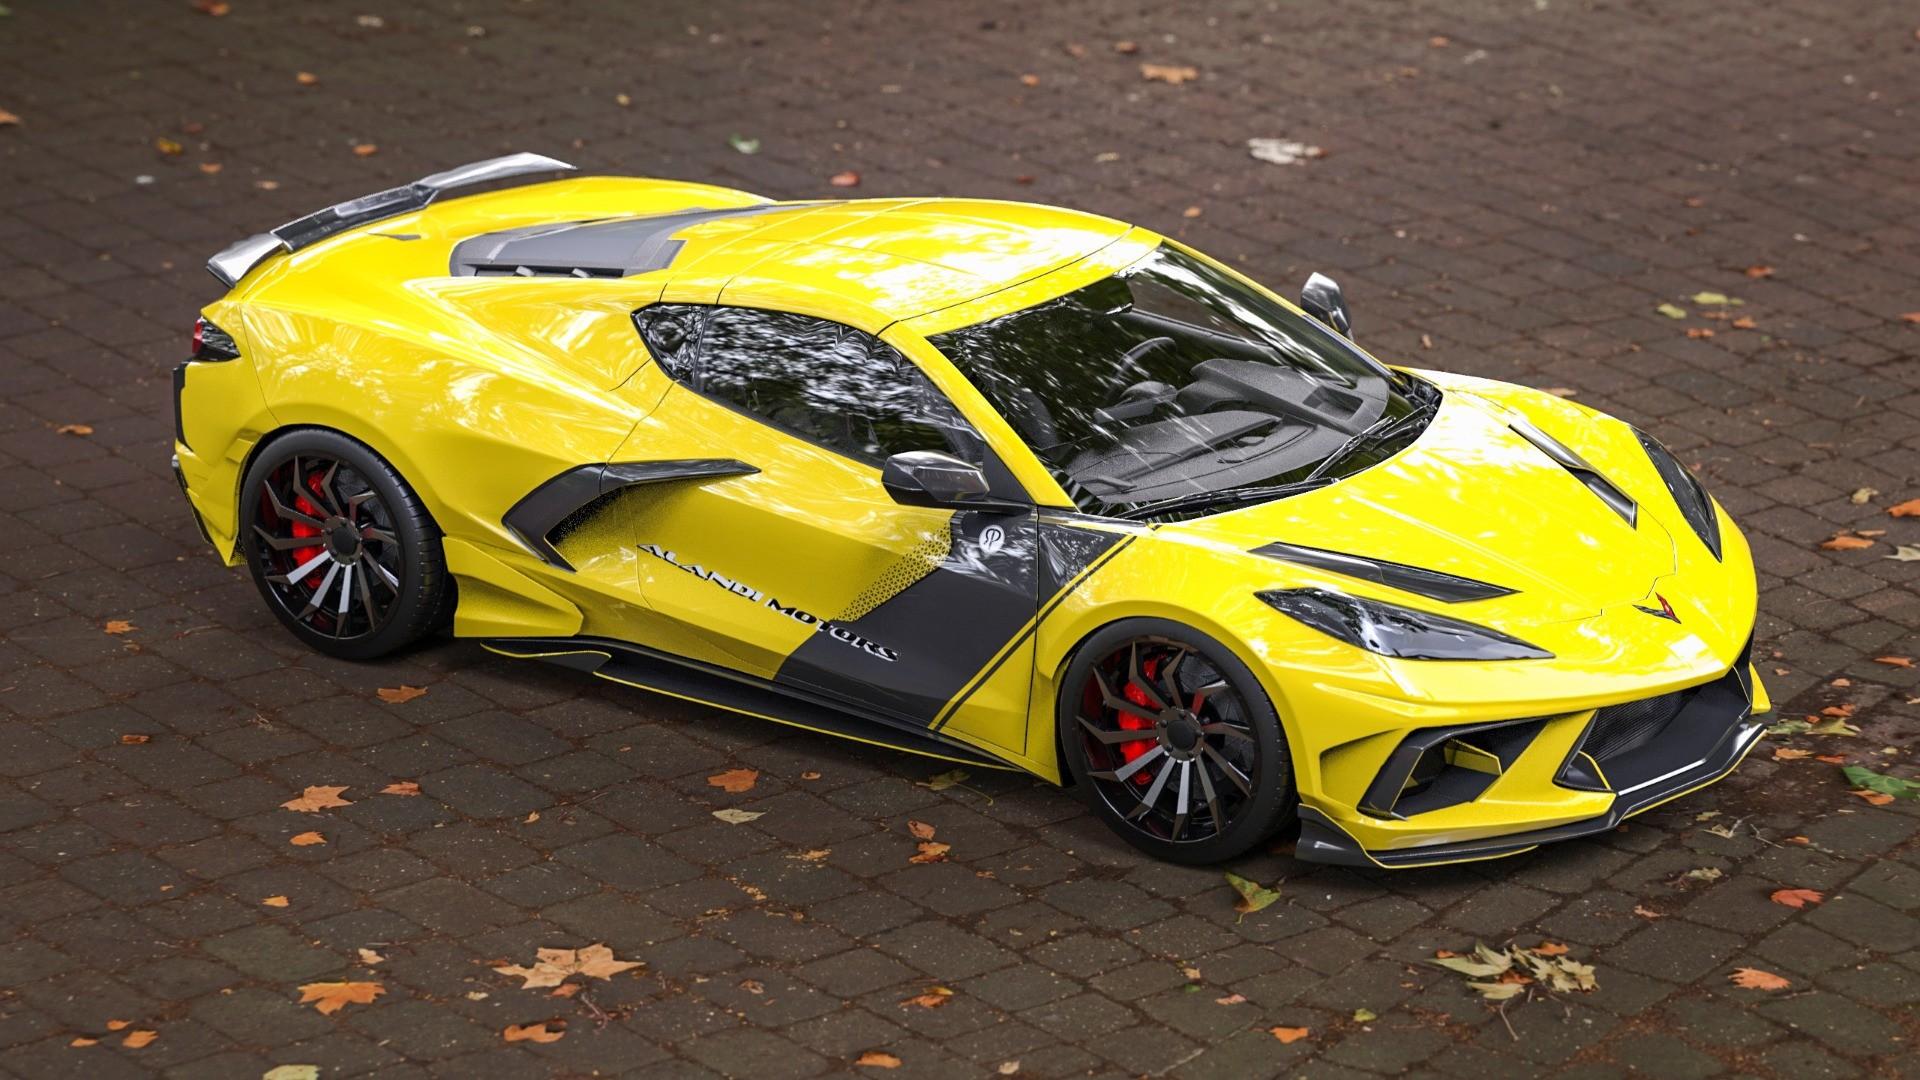 Chevrolet-Corvette-Centurion-by-Alandi-Motors-5